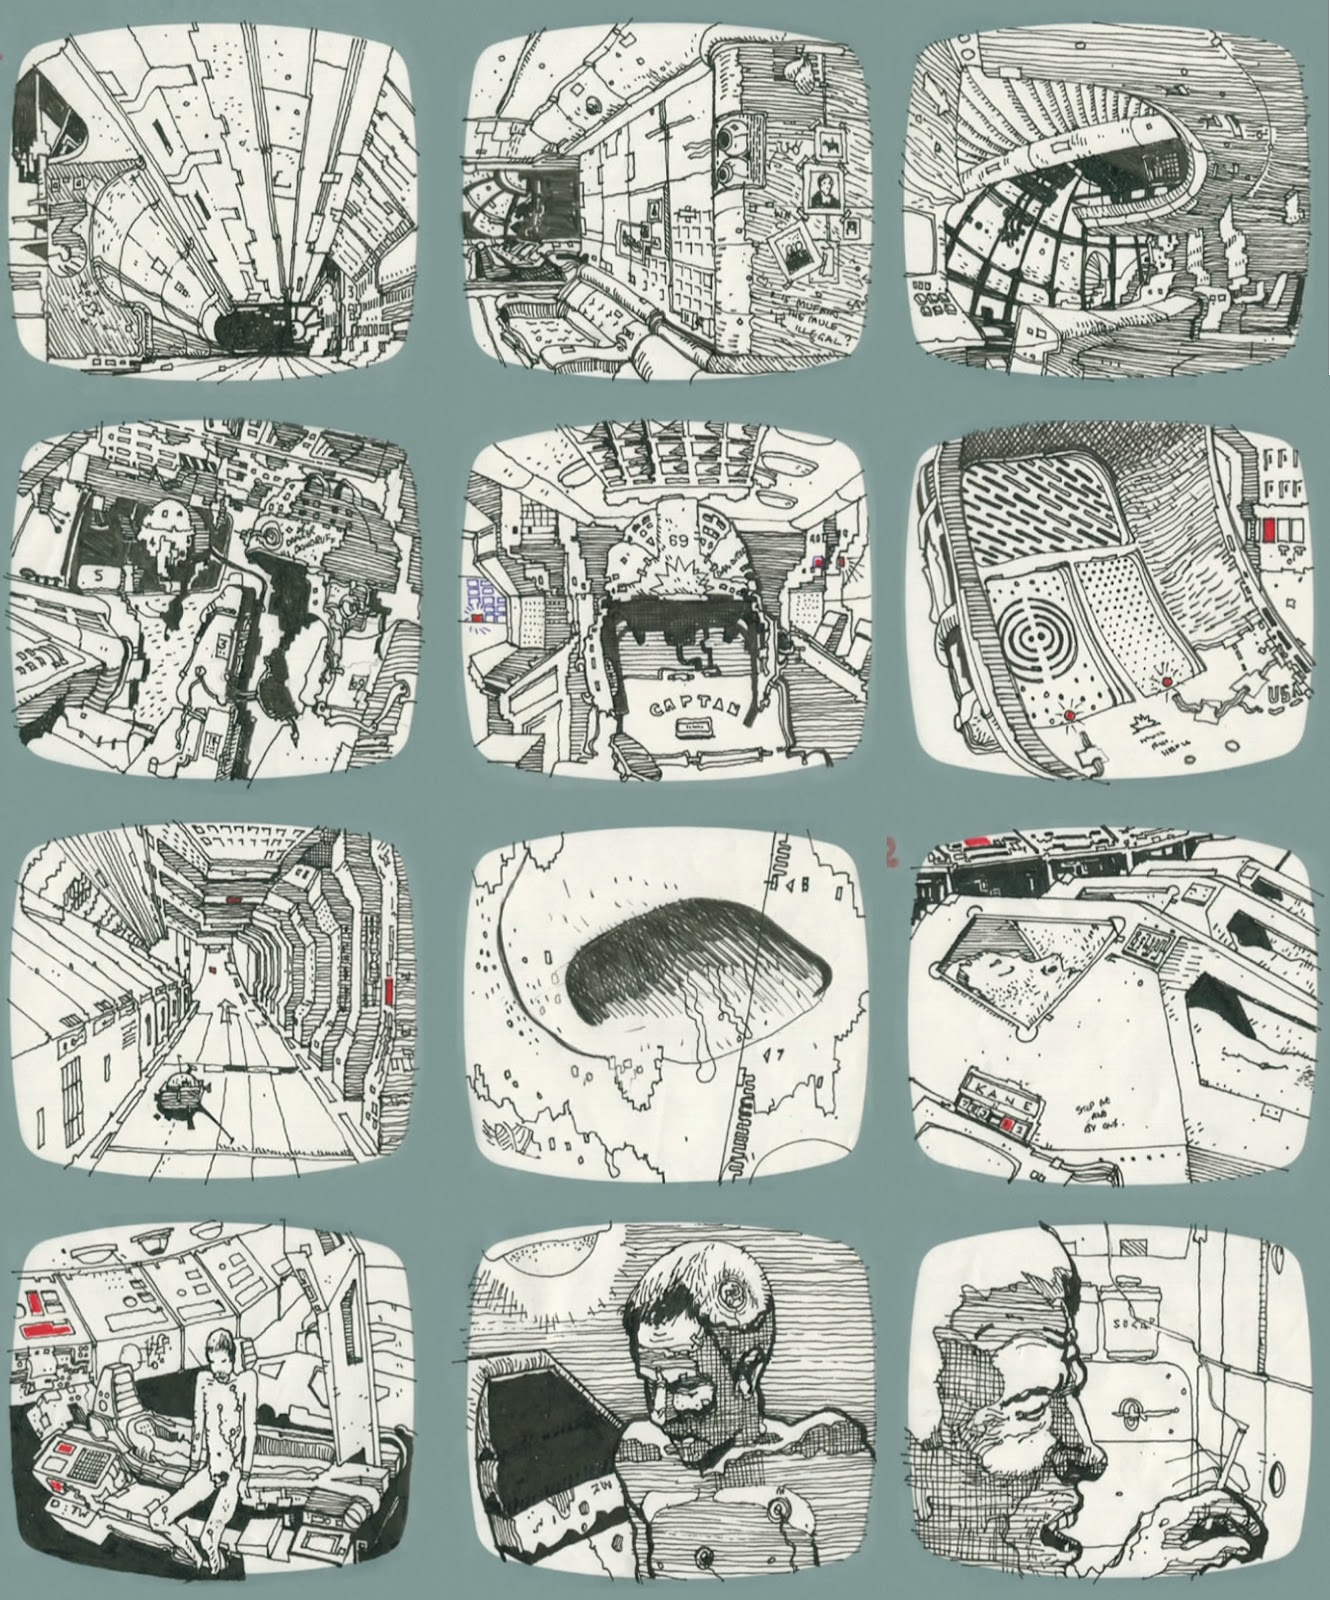 http://4.bp.blogspot.com/-whG8wgU1tr0/T_3O3S2KNsI/AAAAAAAAAS8/eHLnhXIFhko/s1600/ridley-scott-alien-storycoard-comic-form-1.jpg